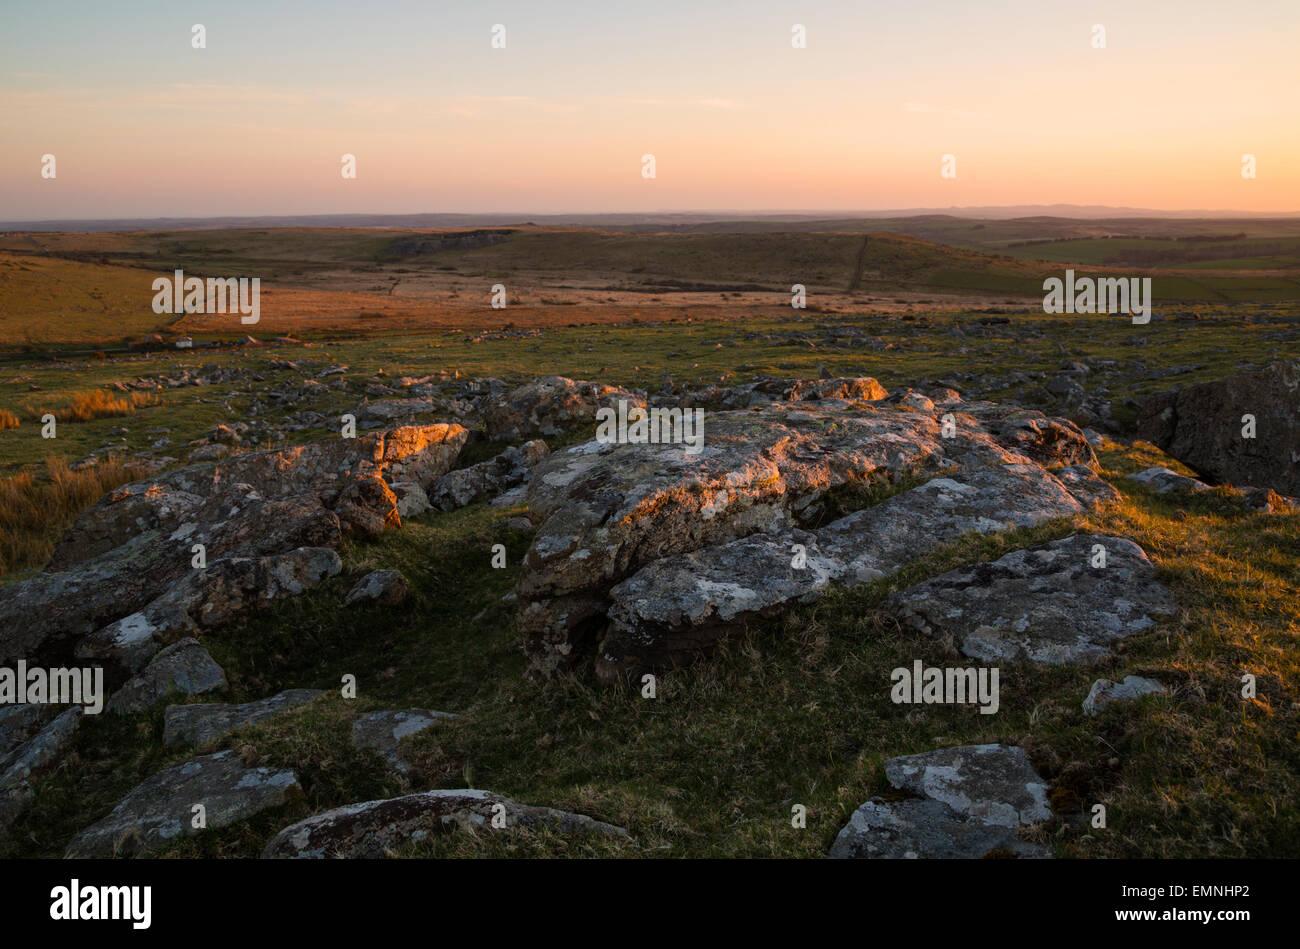 Warm evening light falling on Bodmin moor in East Cornwall Stock Photo